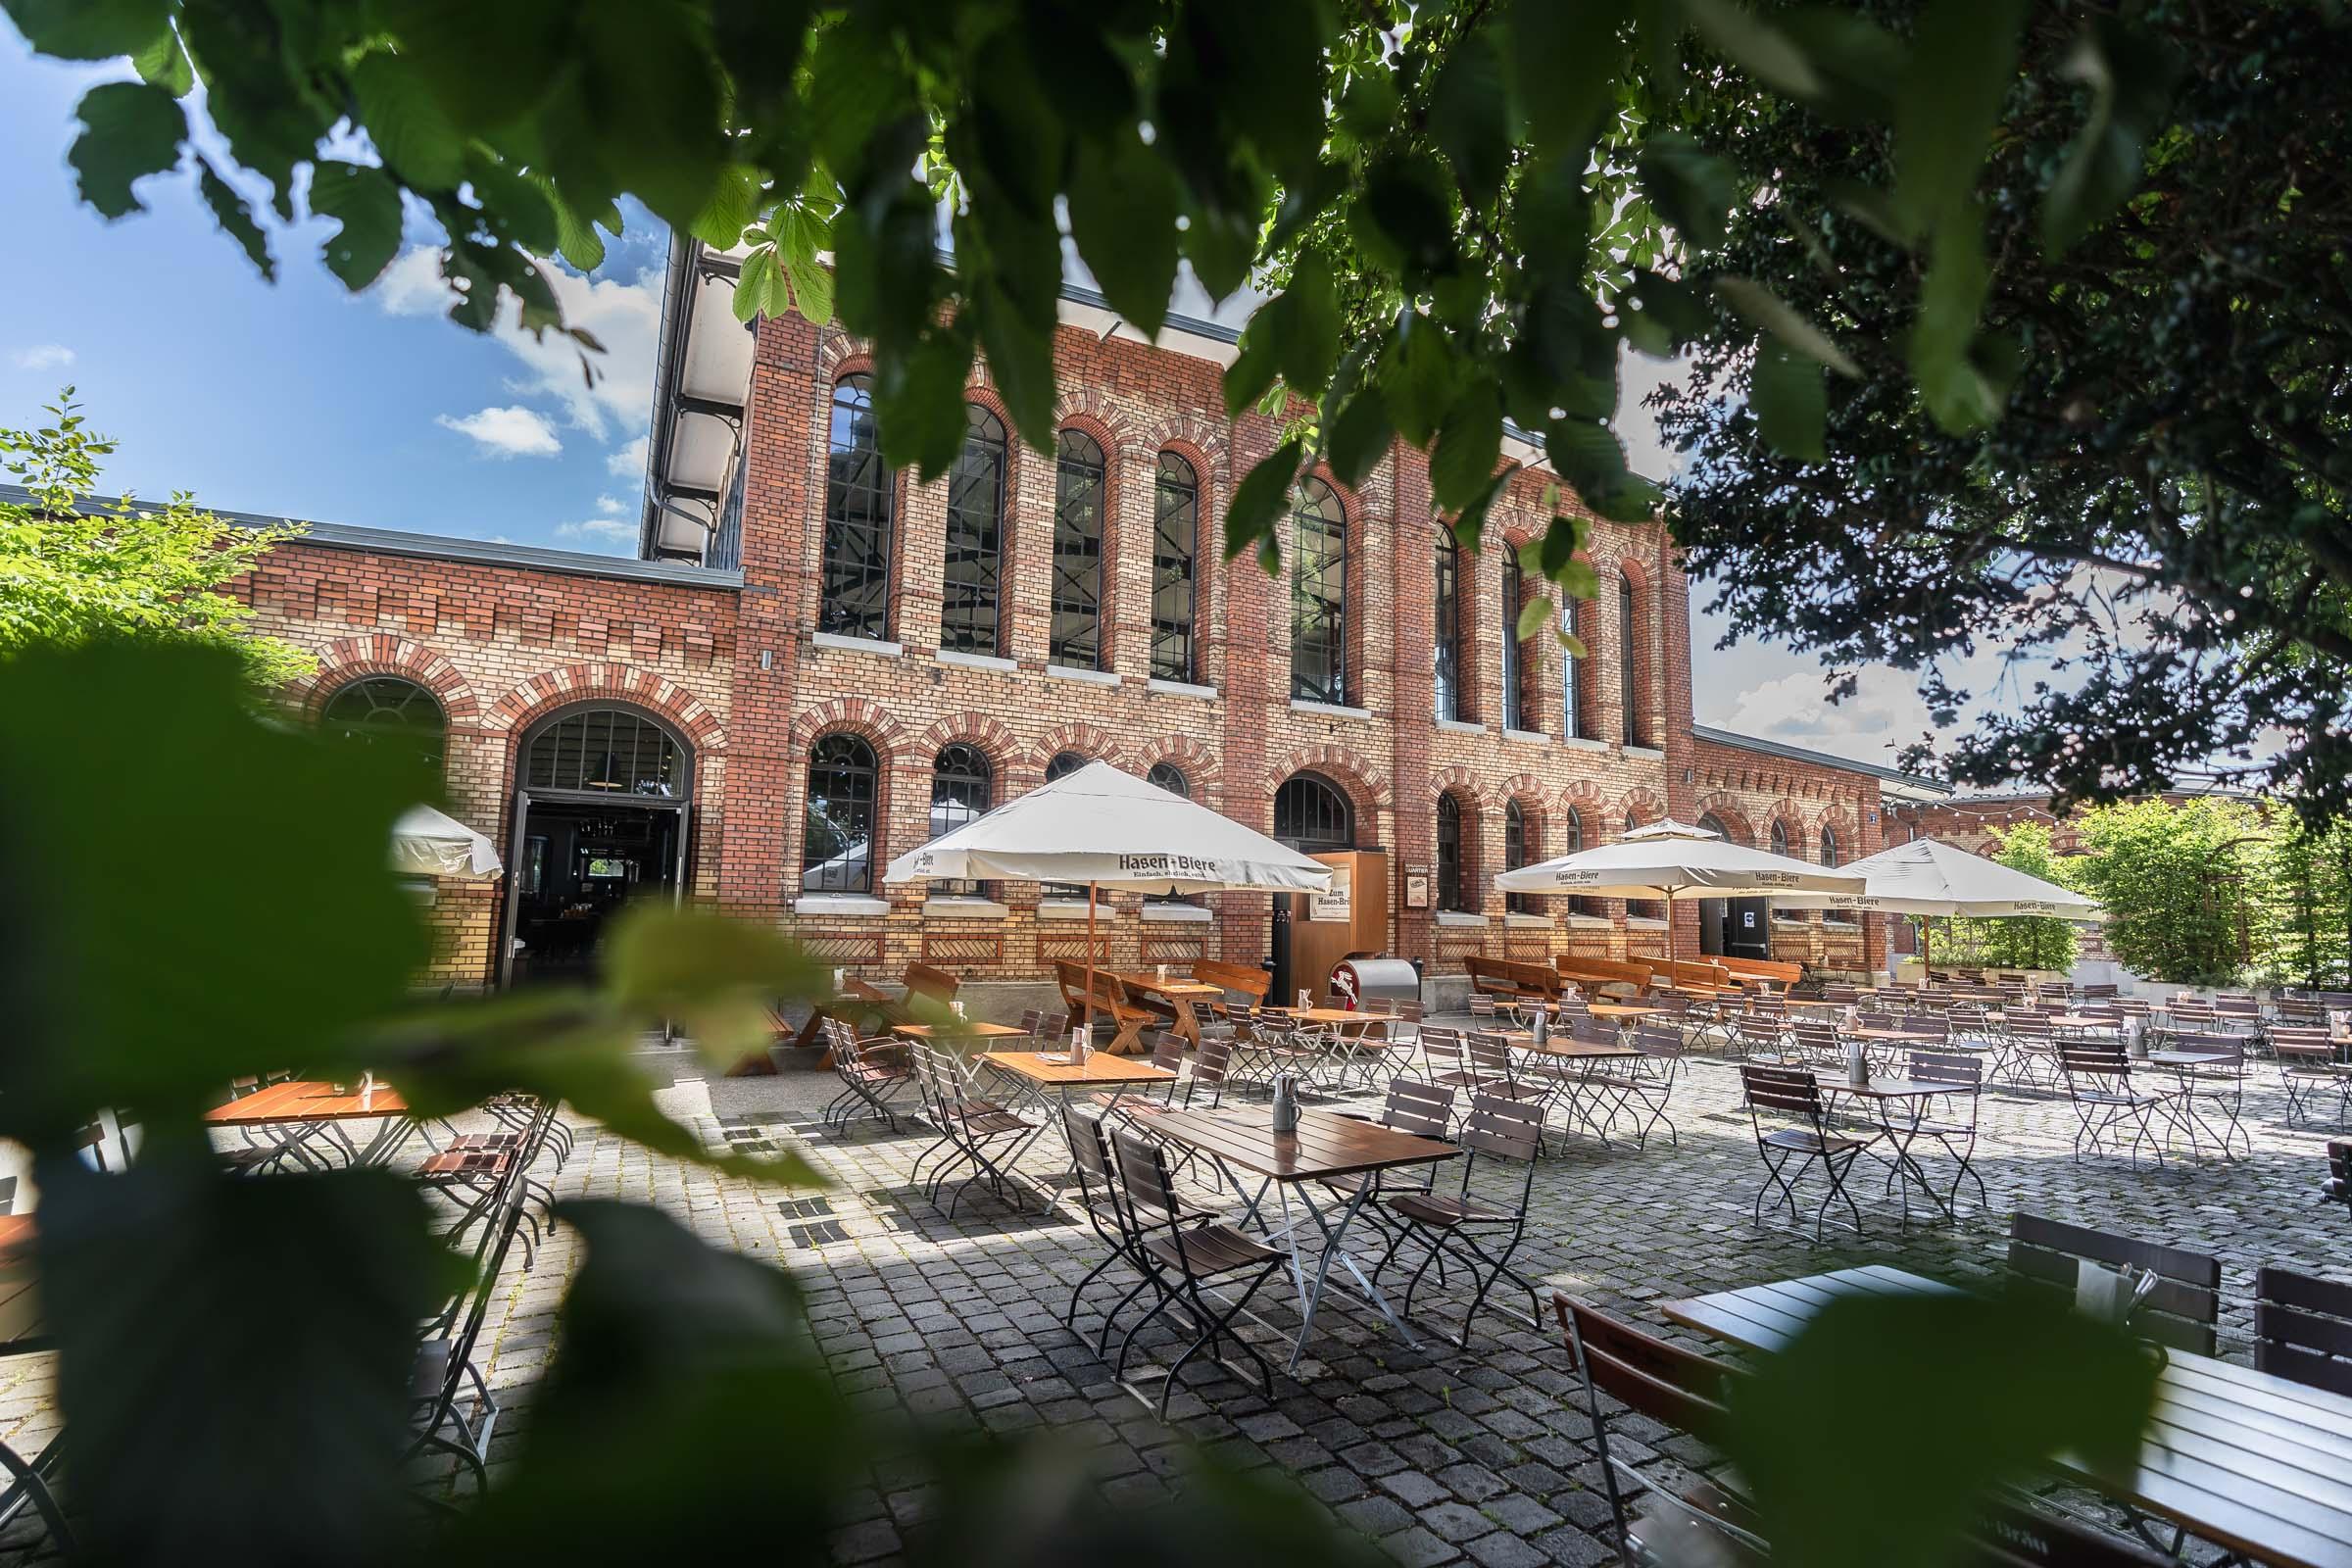 Hasenbrauhaus Brewery Grill Restaurant Kalberhalle Augsburg